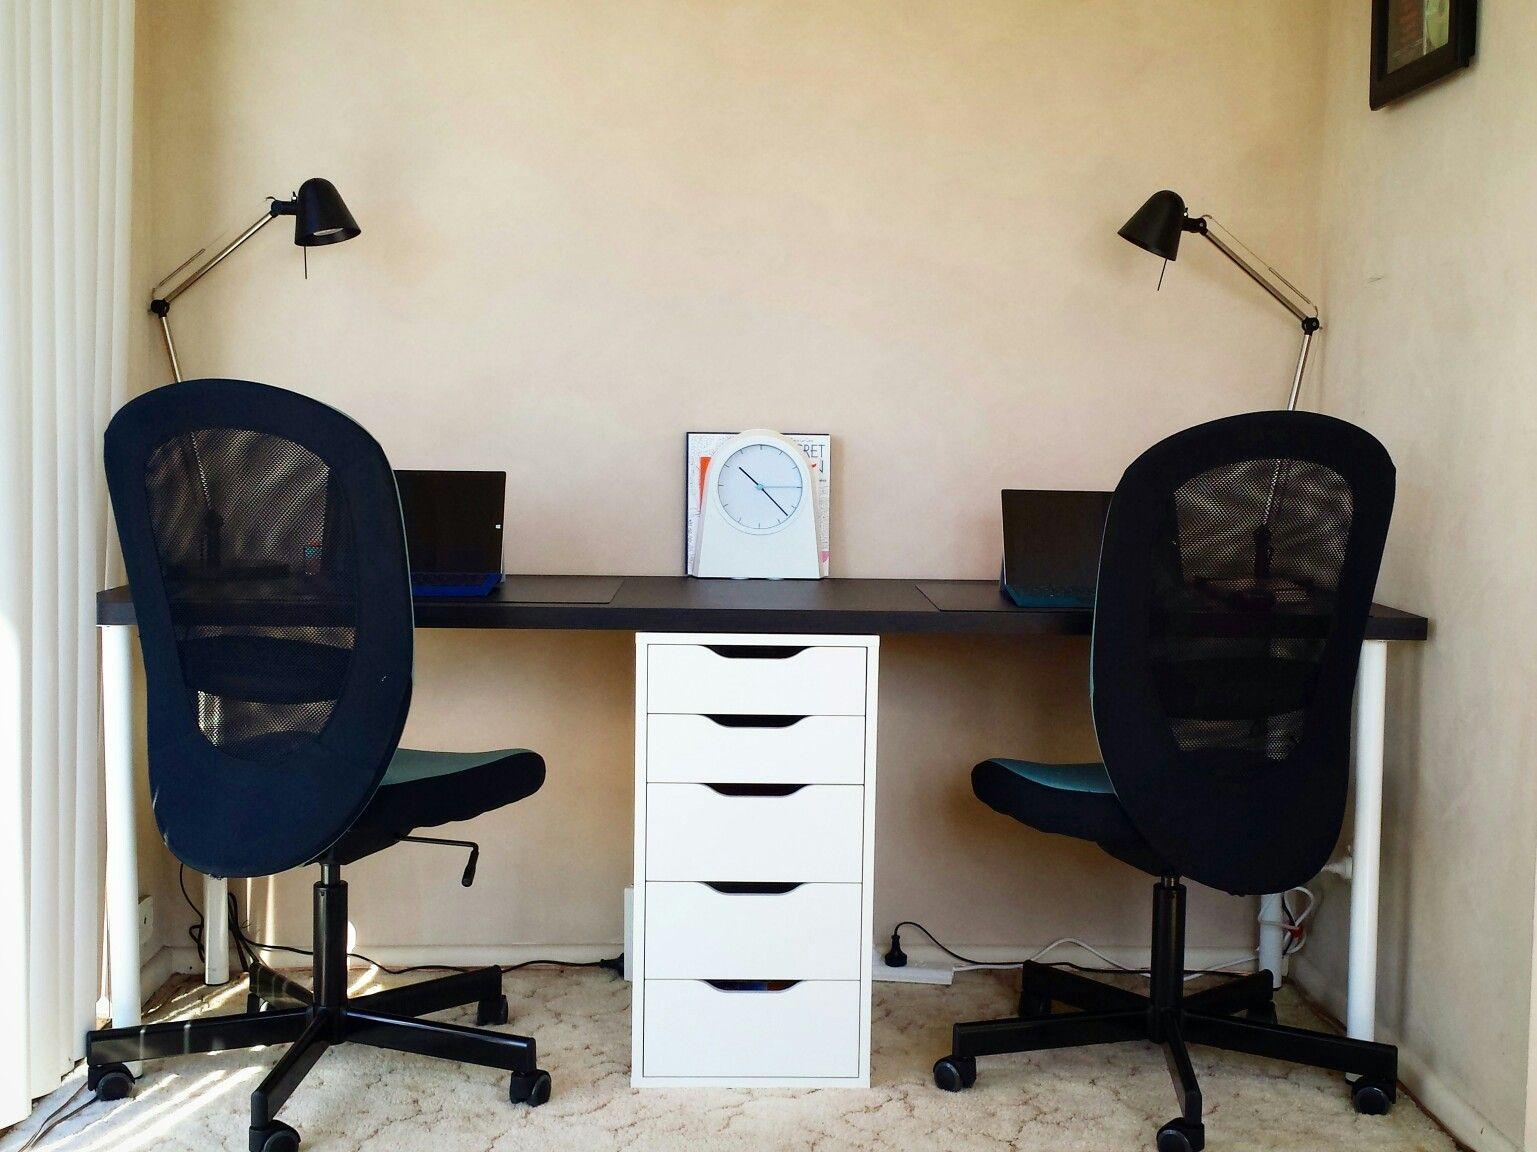 Desk For Two Using Ikea Furniture Linnmon Table Top Black Brown 200cm X 60cm 75 Aus Dollars Alex Drawer U Ikea White Desk Ikea Home Office Ikea Alex Desk